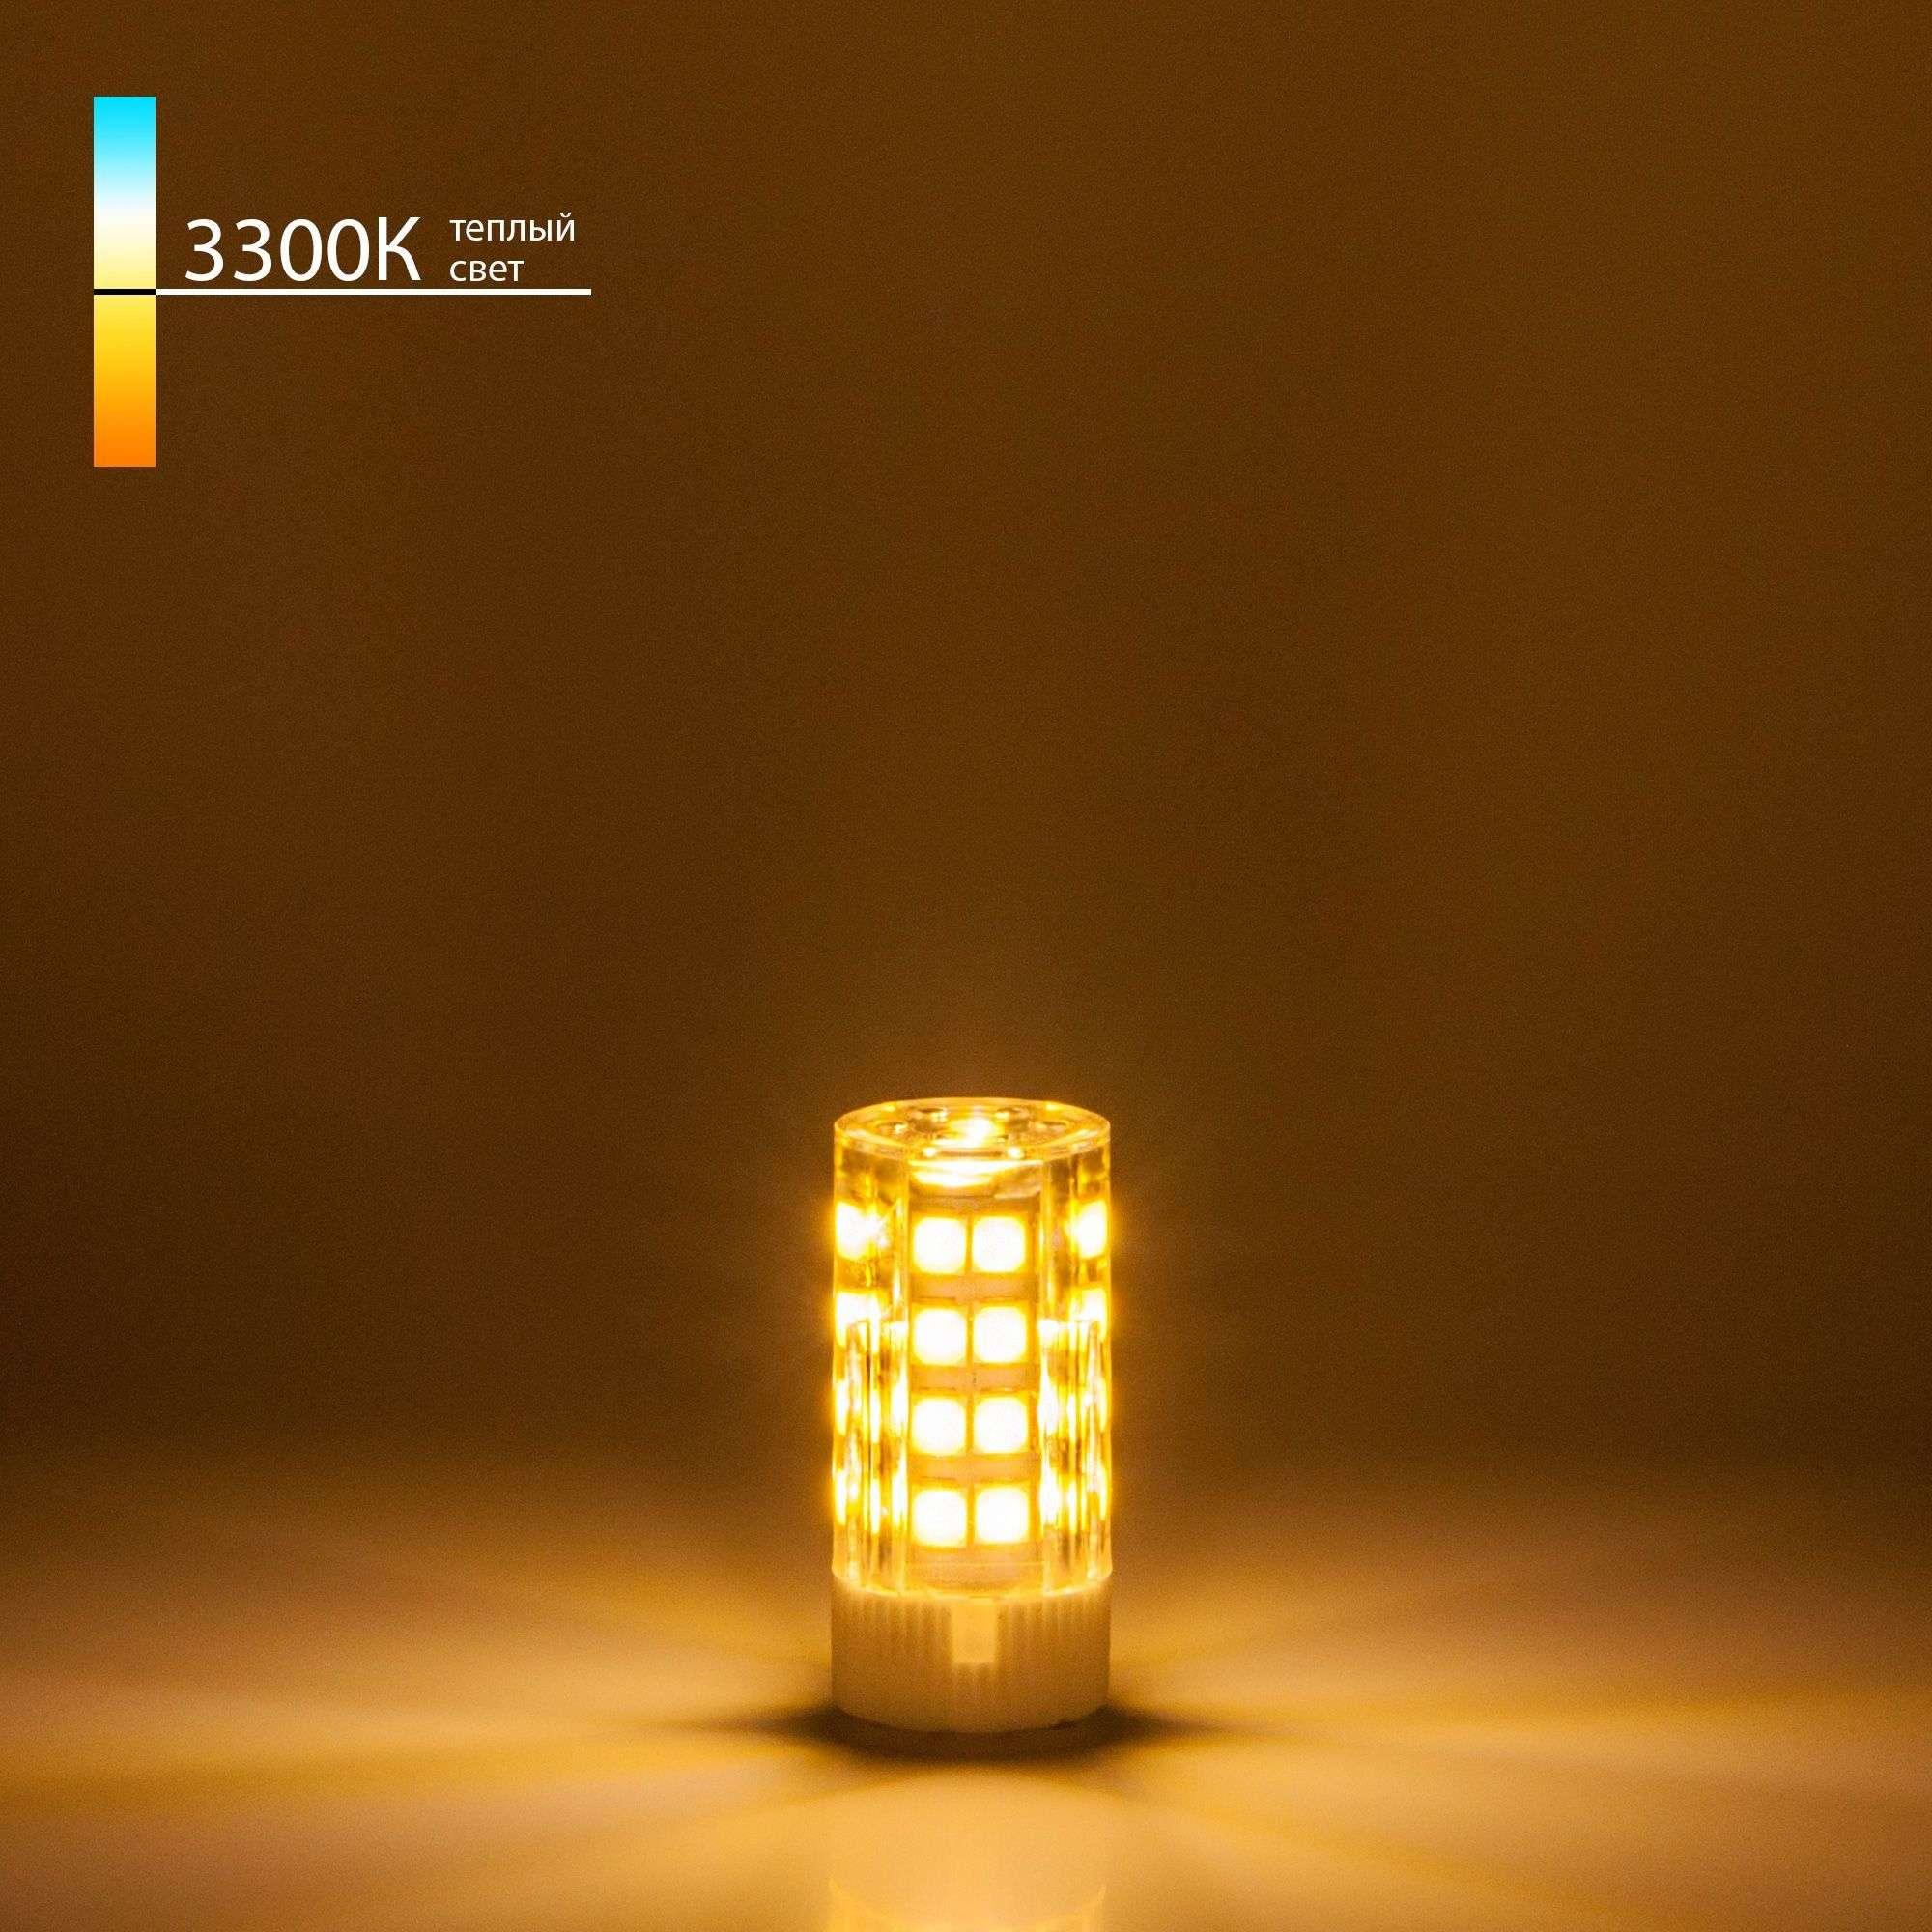 Cветодиодная лампа 7W 3300K G4 G4 LED BL107 7W 220V 3300K